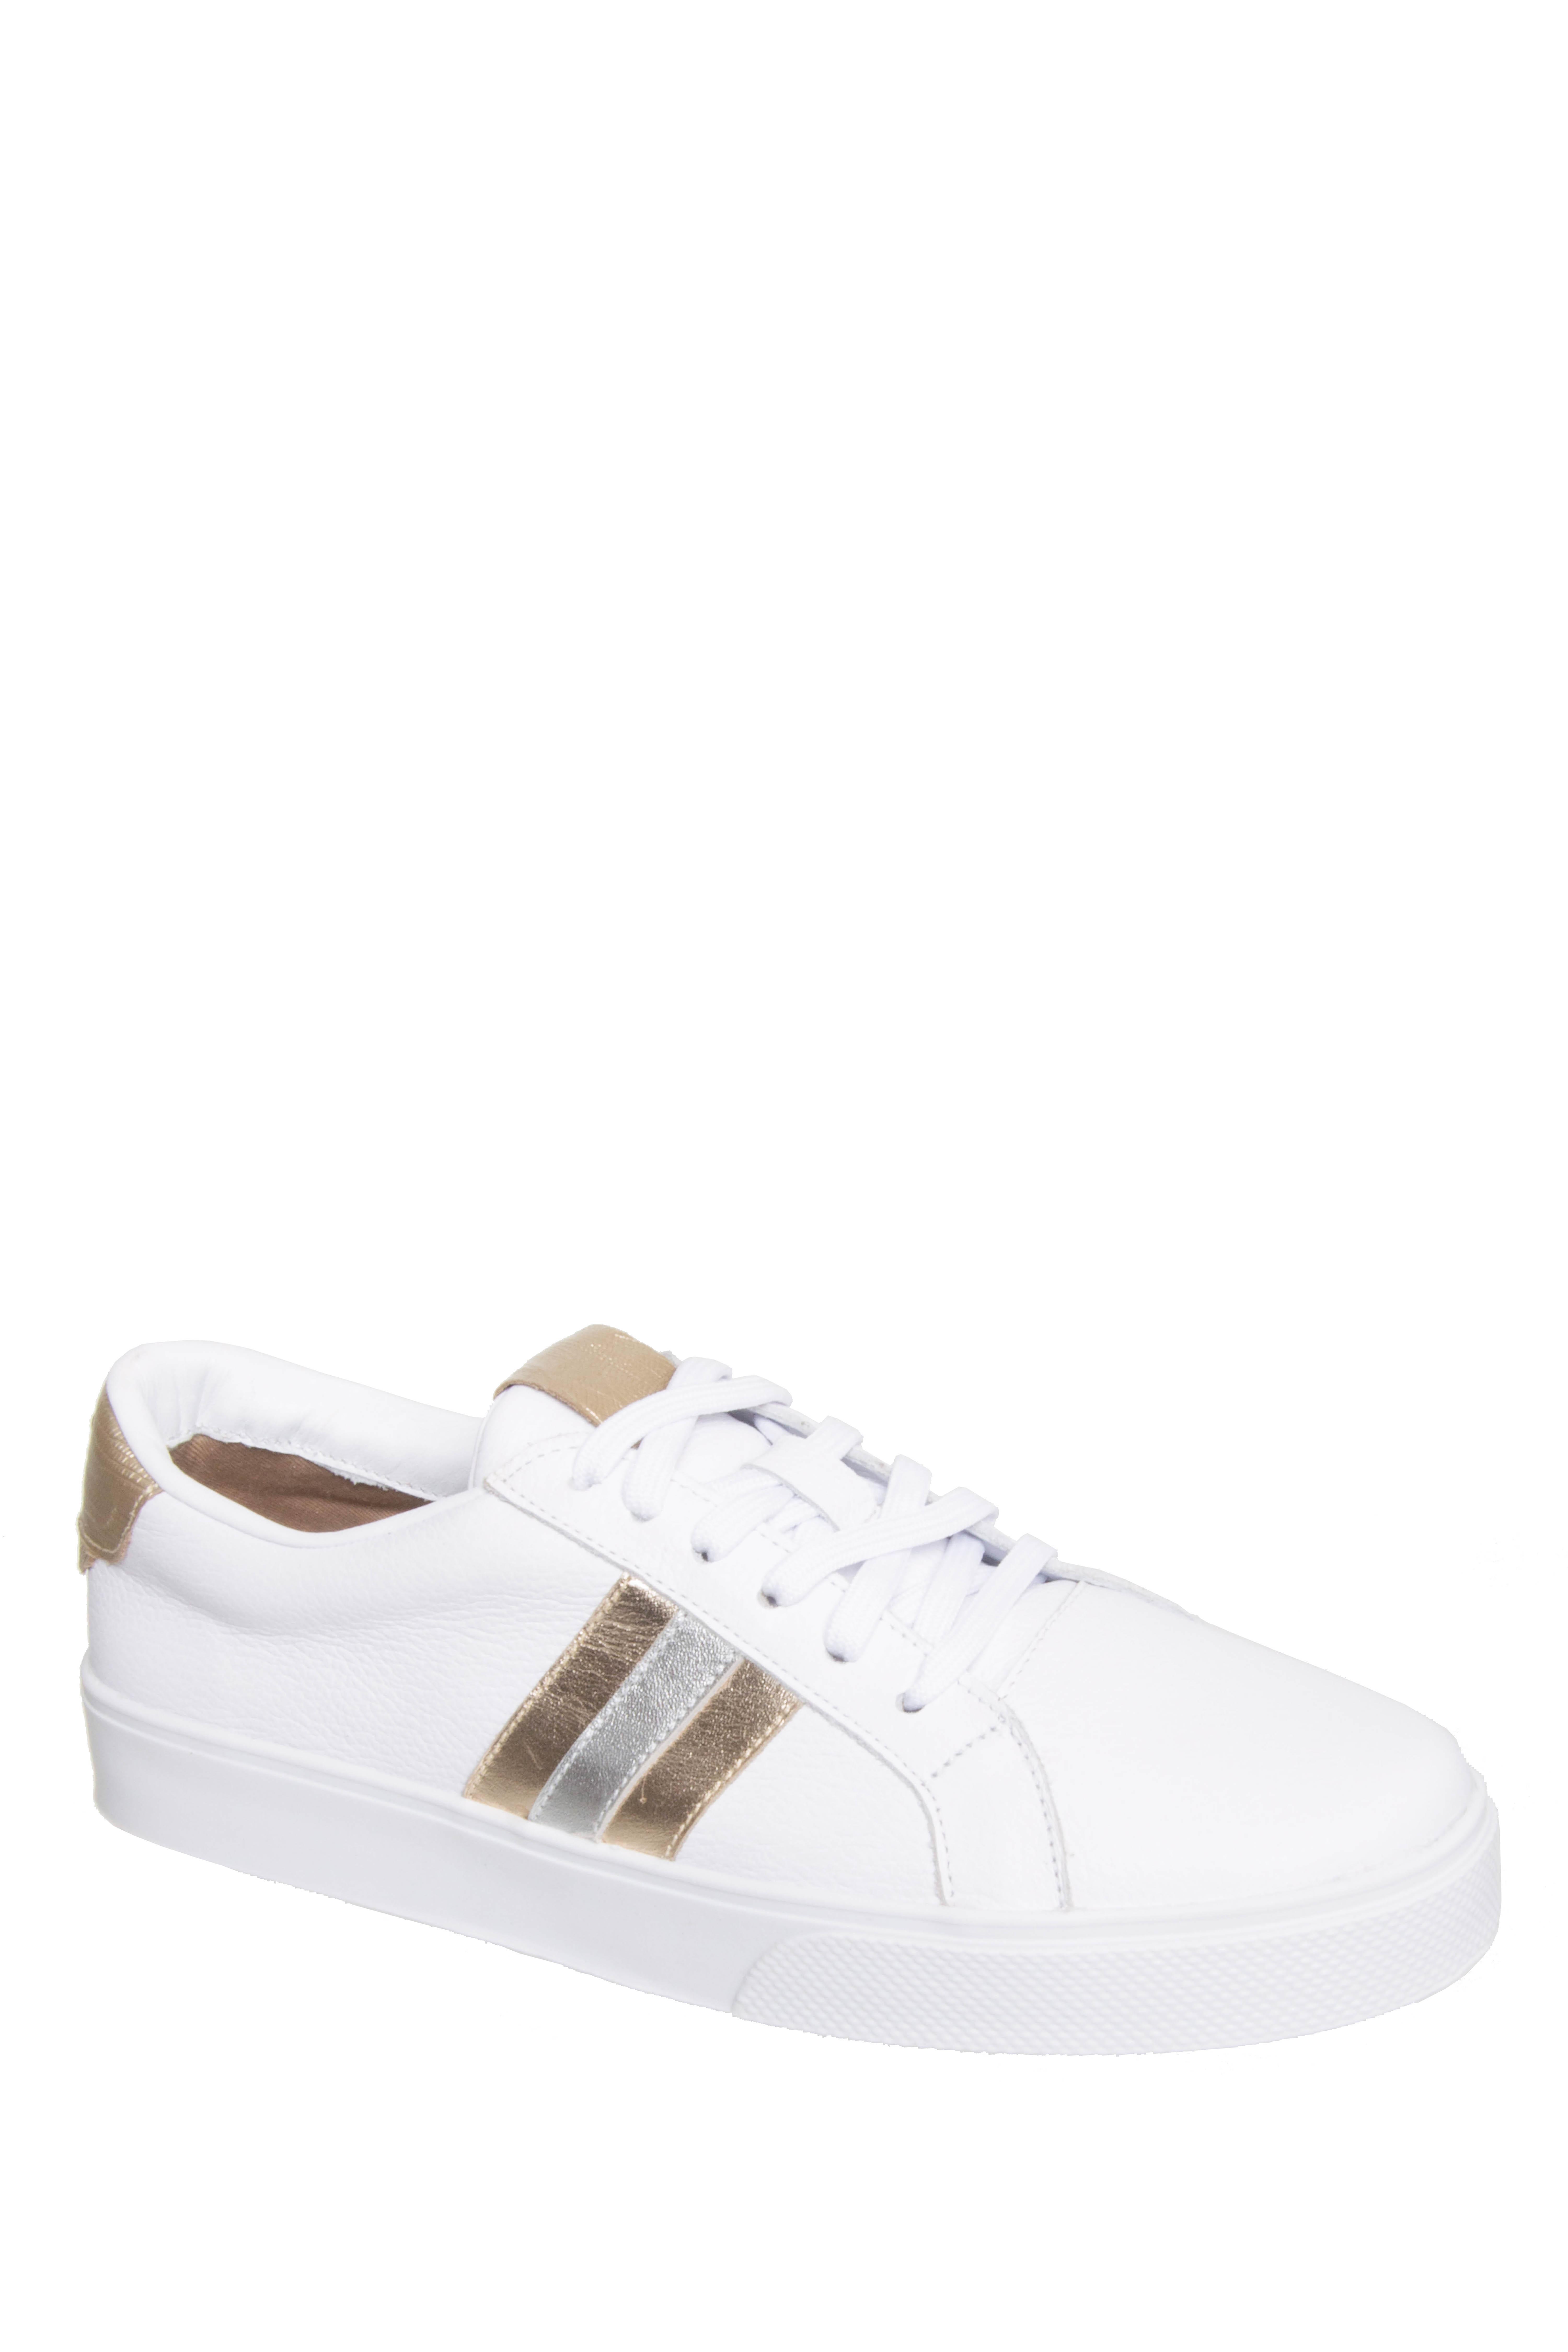 Kaanas Tatacoa Lace-up Sneakers - White